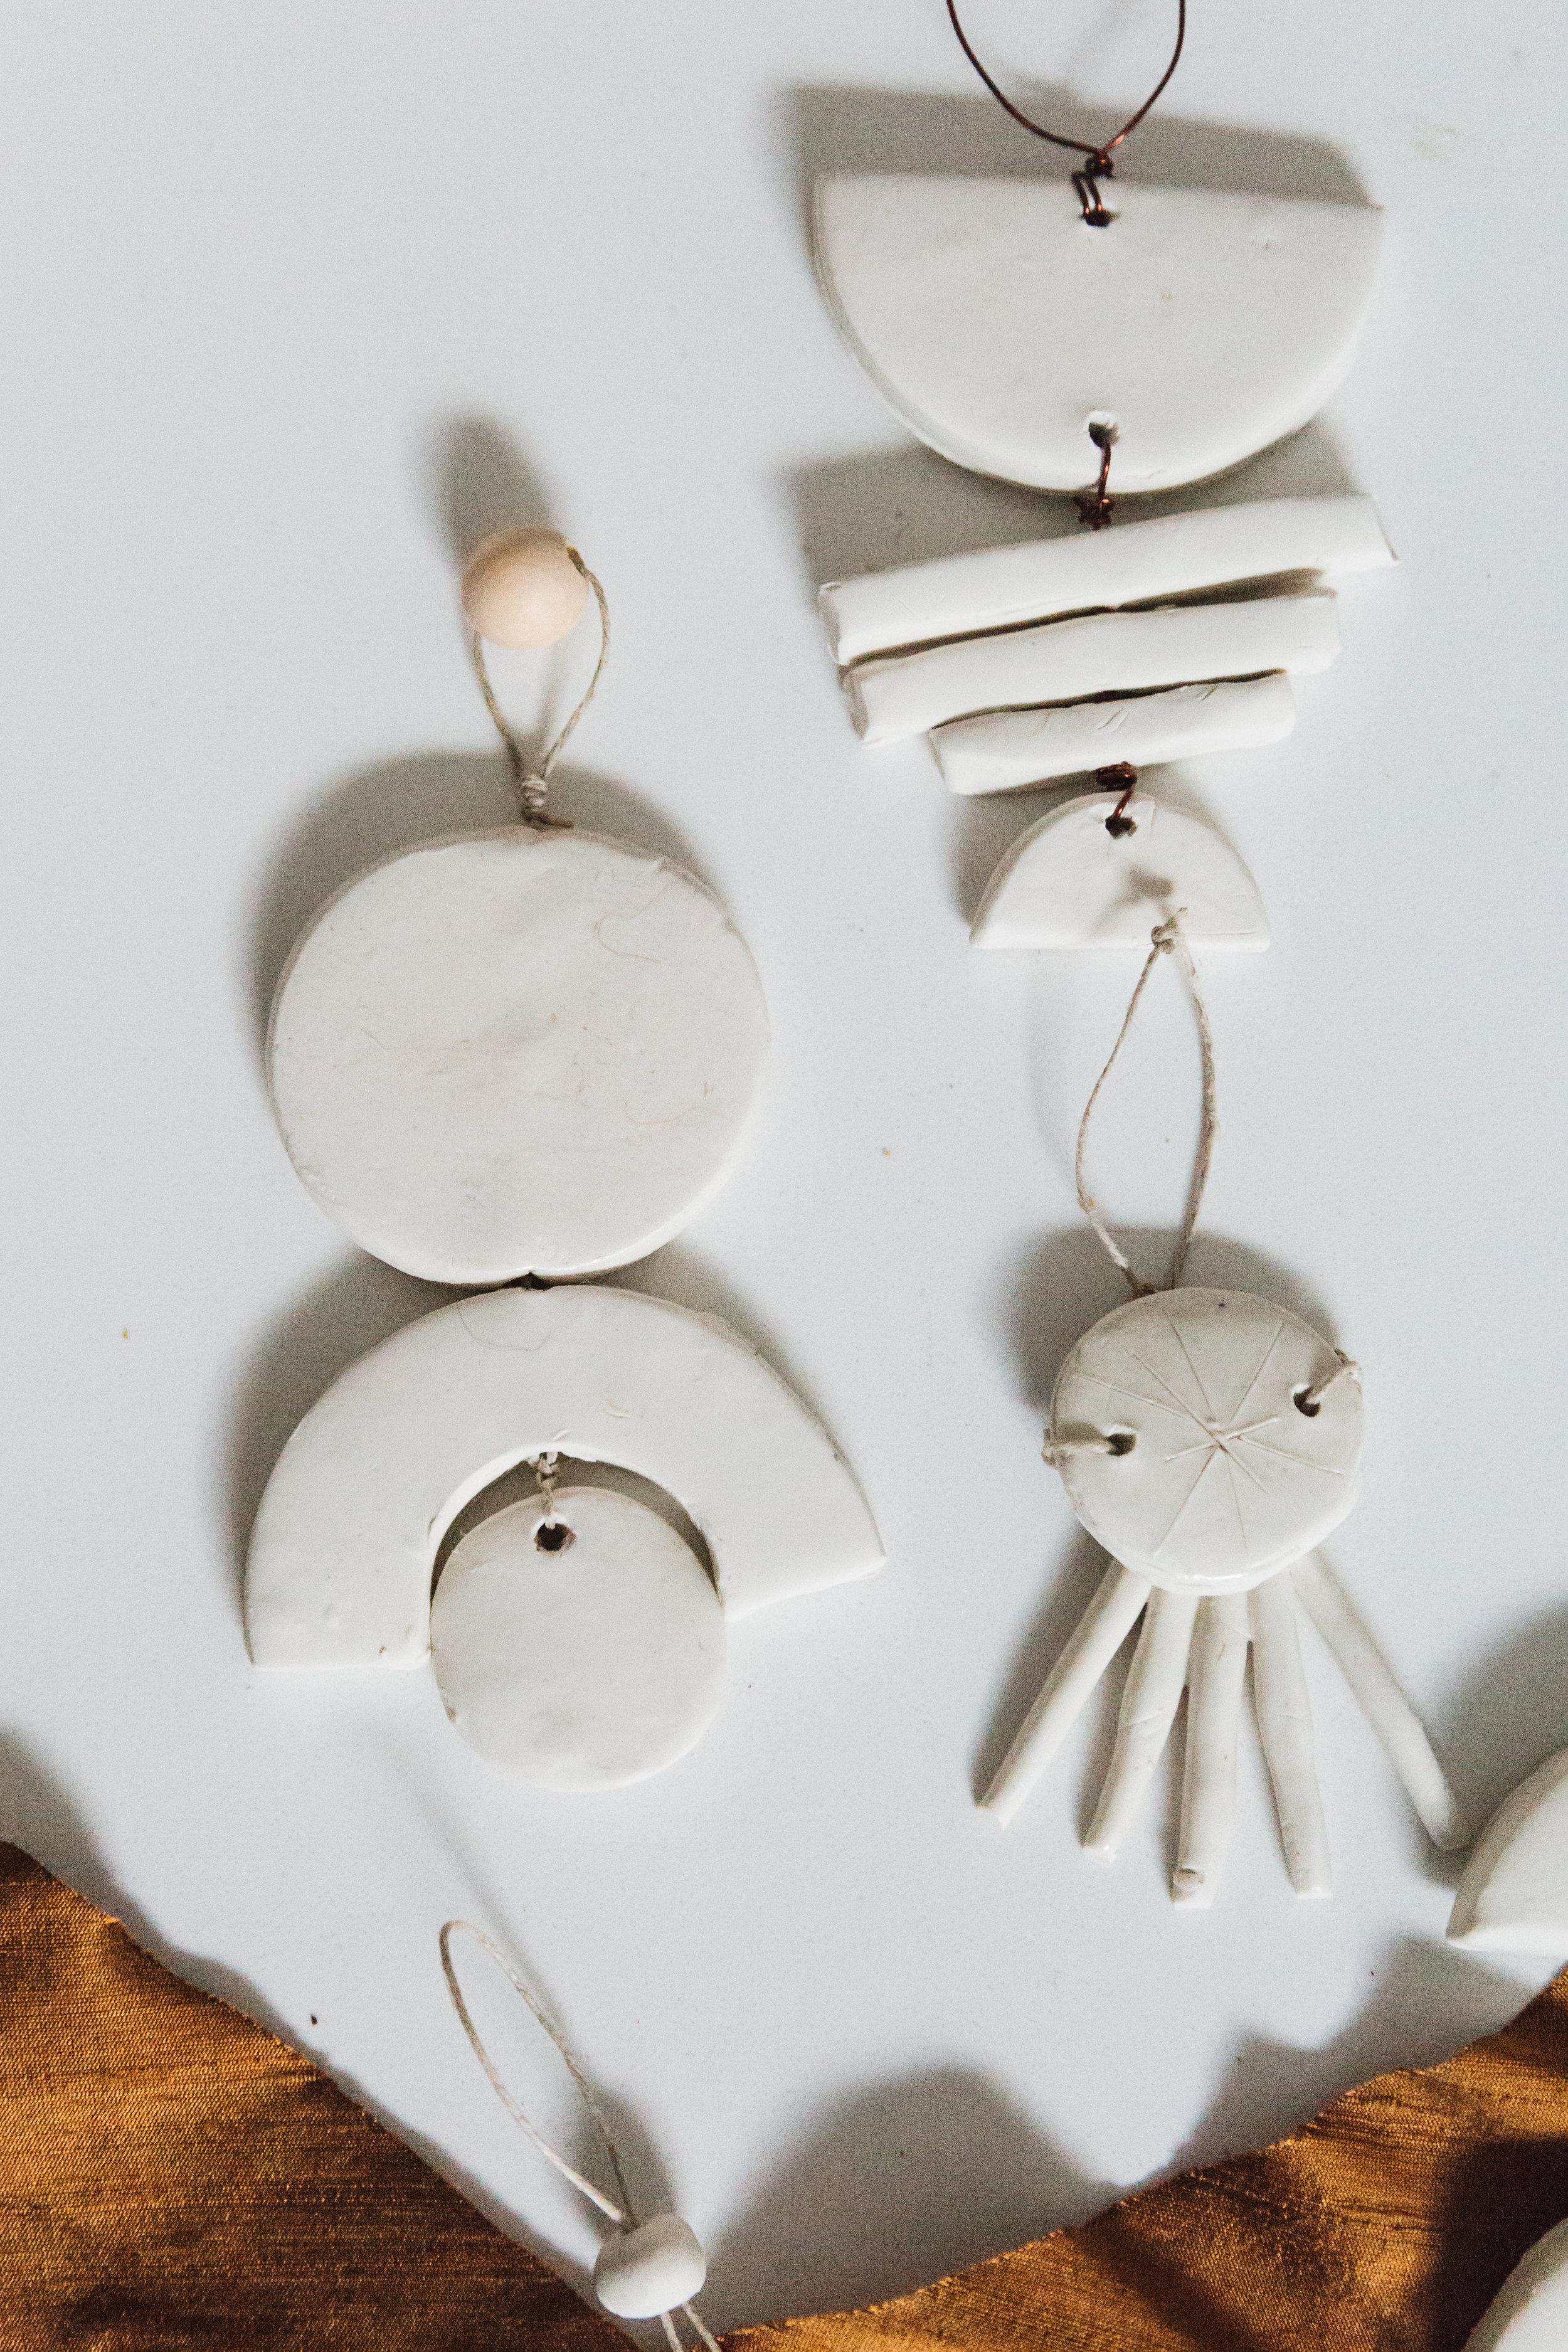 clay-9832.jpg